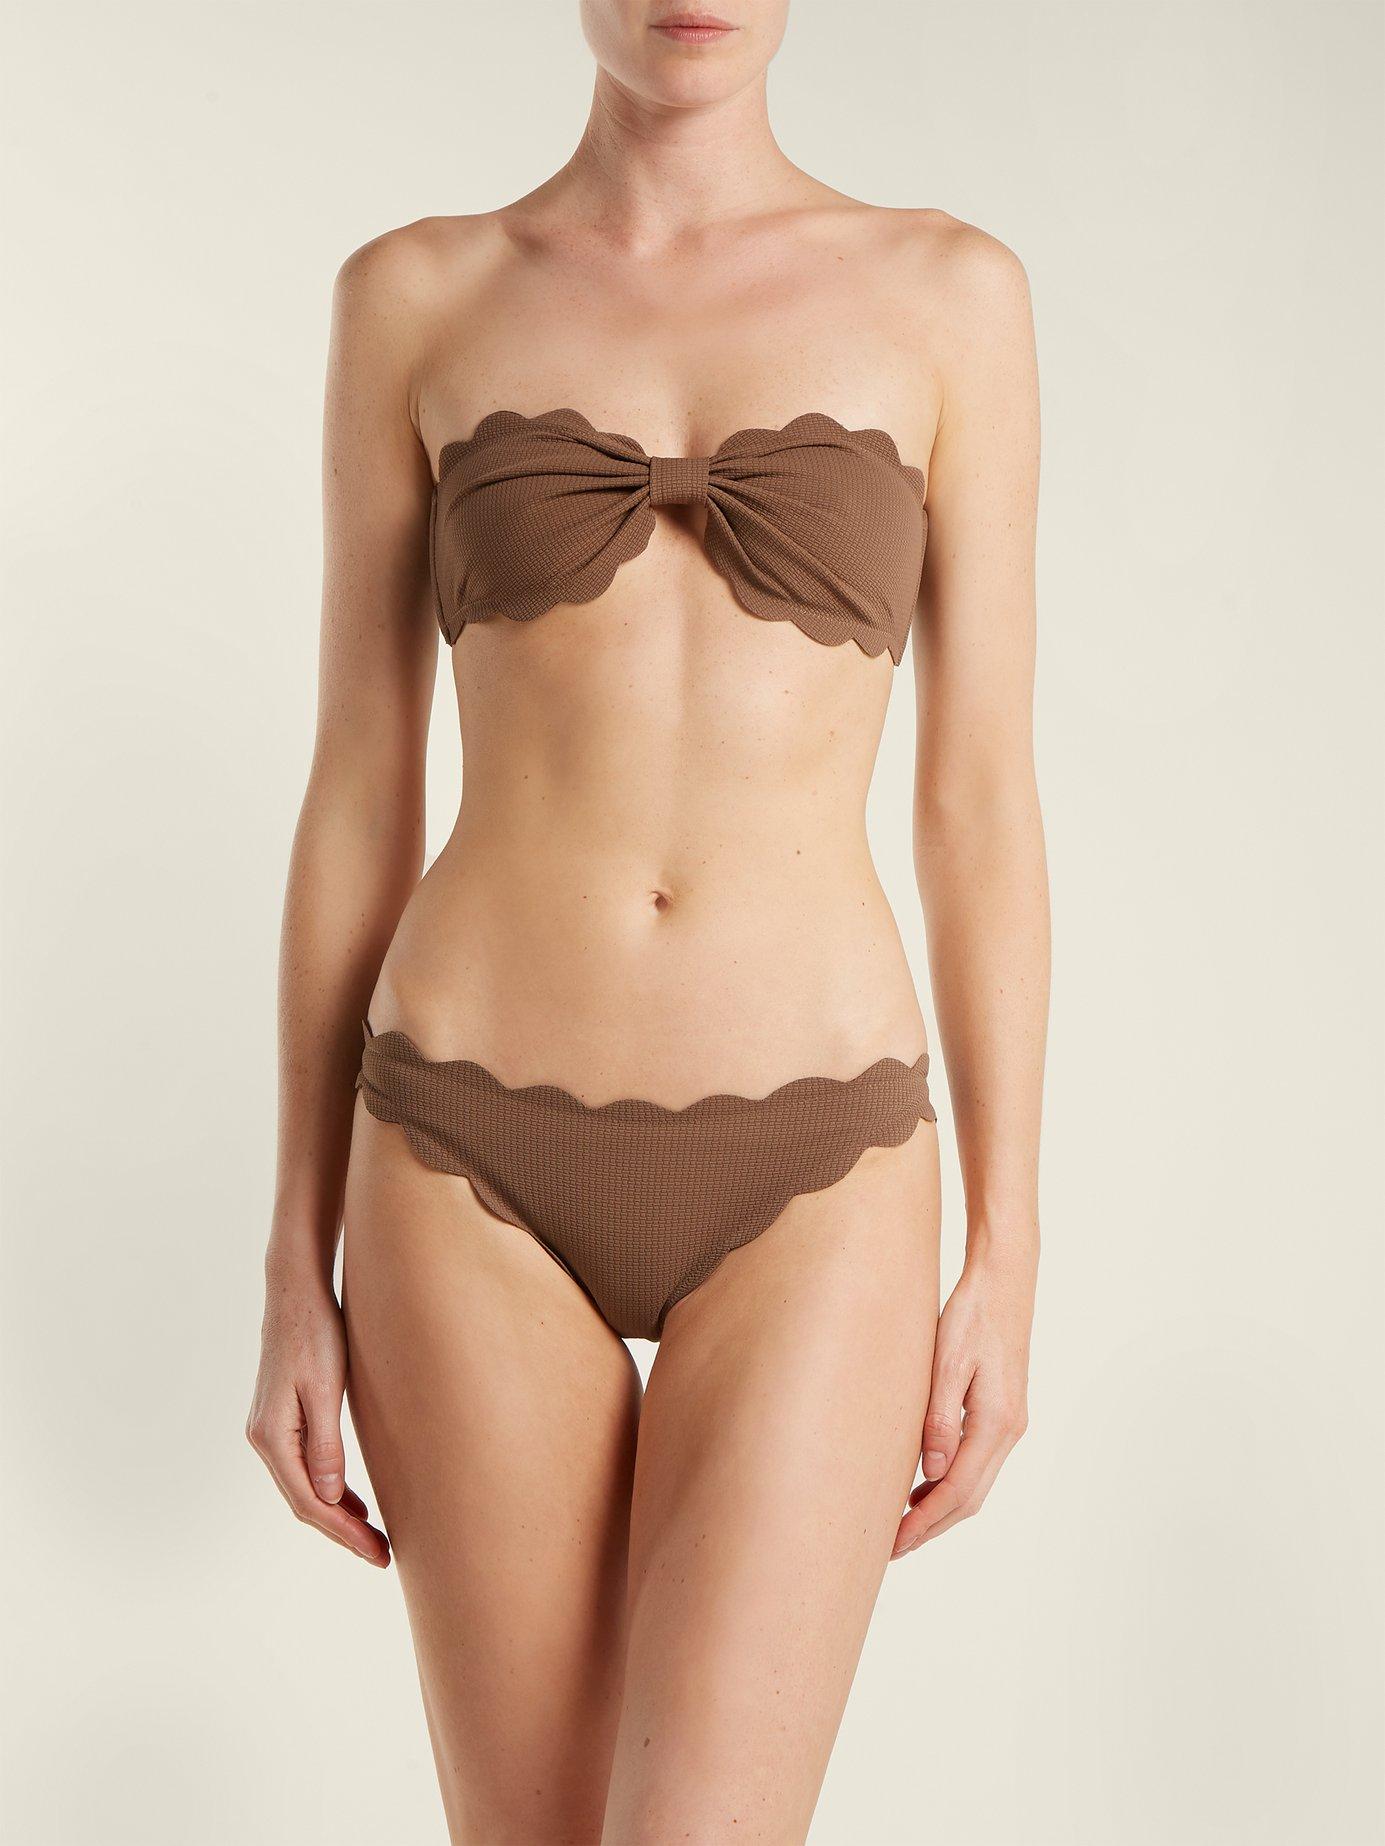 Antibes scallop-edged bandeau bikini top by Marysia Swim